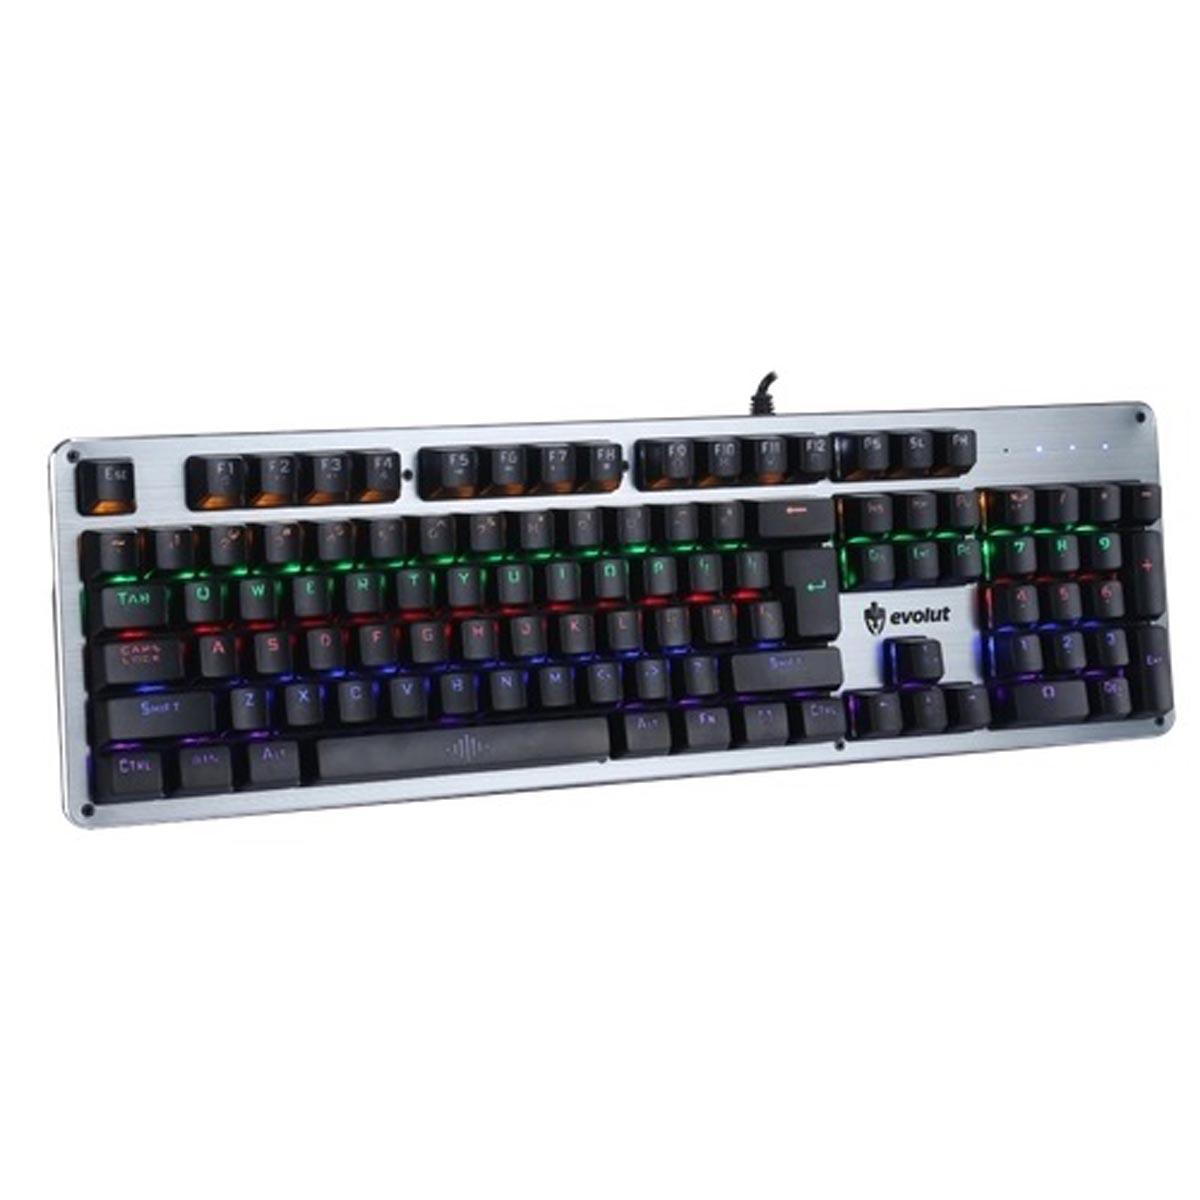 Teclado Mecanico Gamer EG208 Evolut Blacsmith Switch Blue